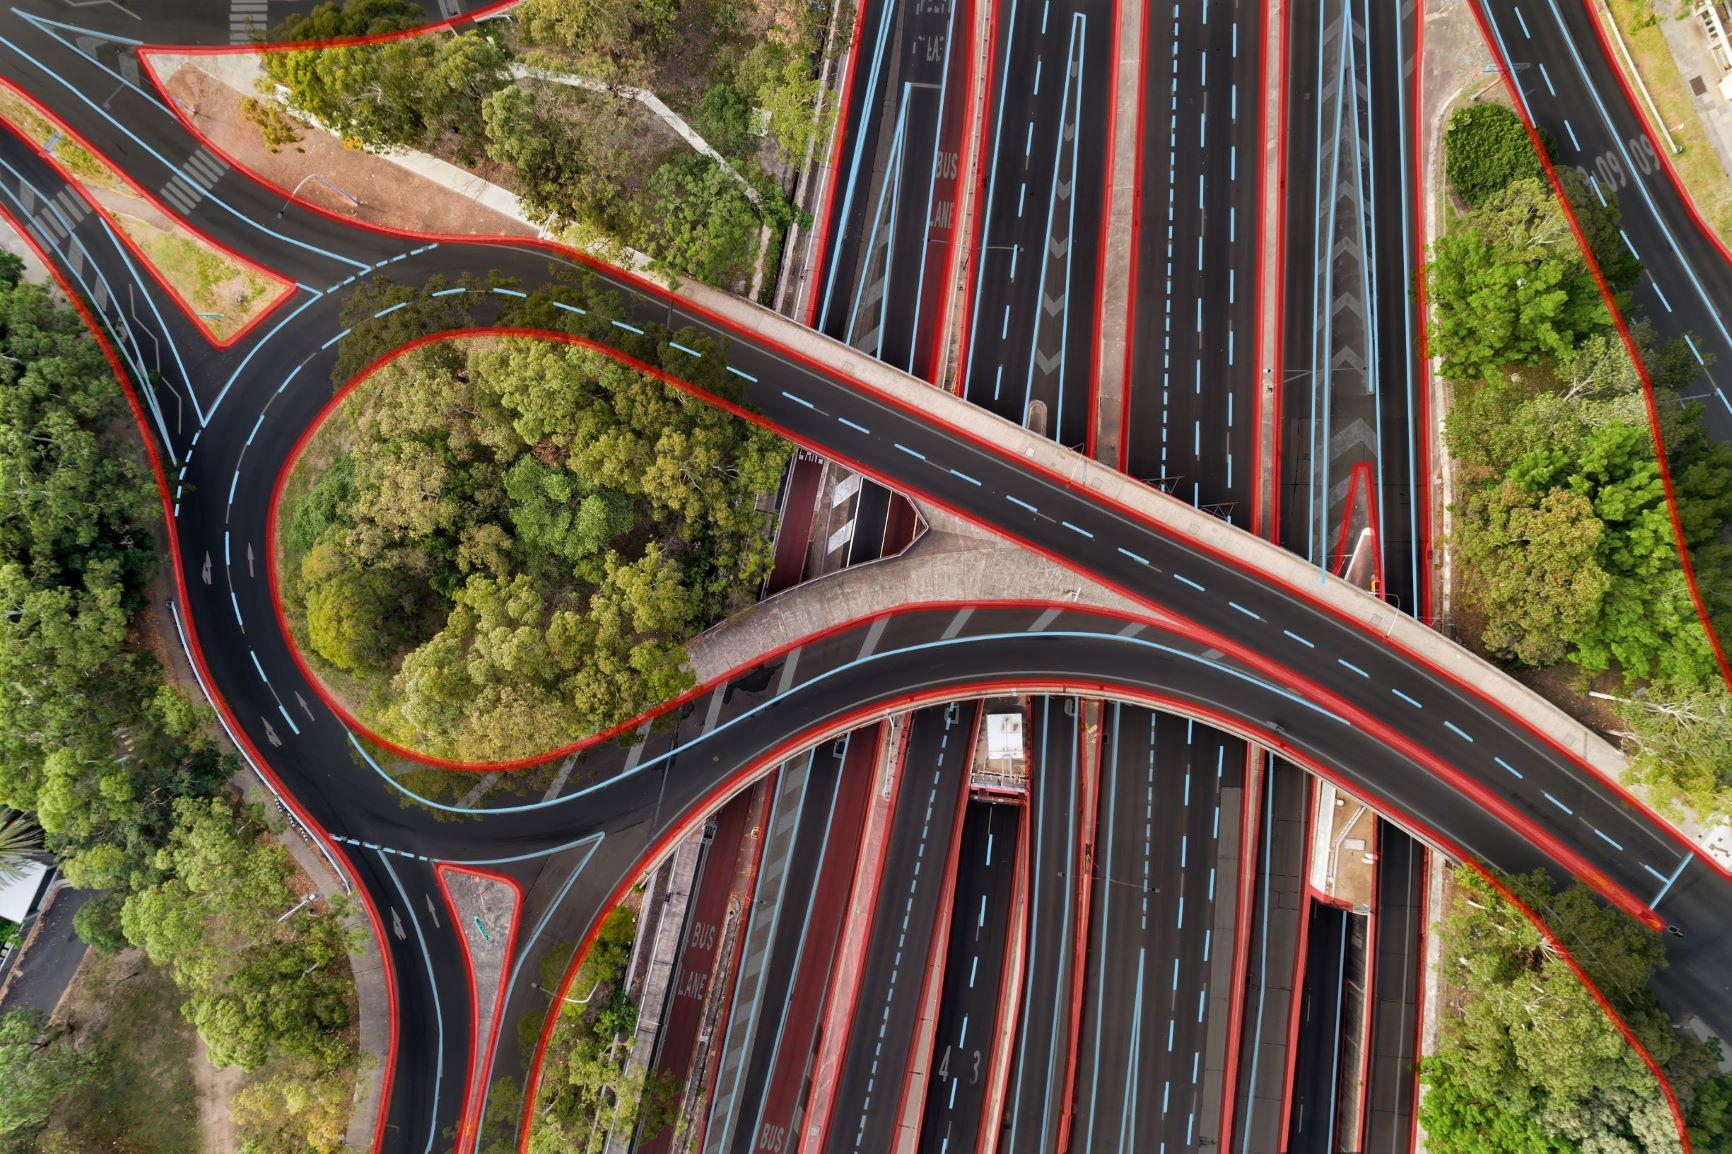 venturebeat.com - Paul Sawers - How TomTom is evolving for autonomous vehicles